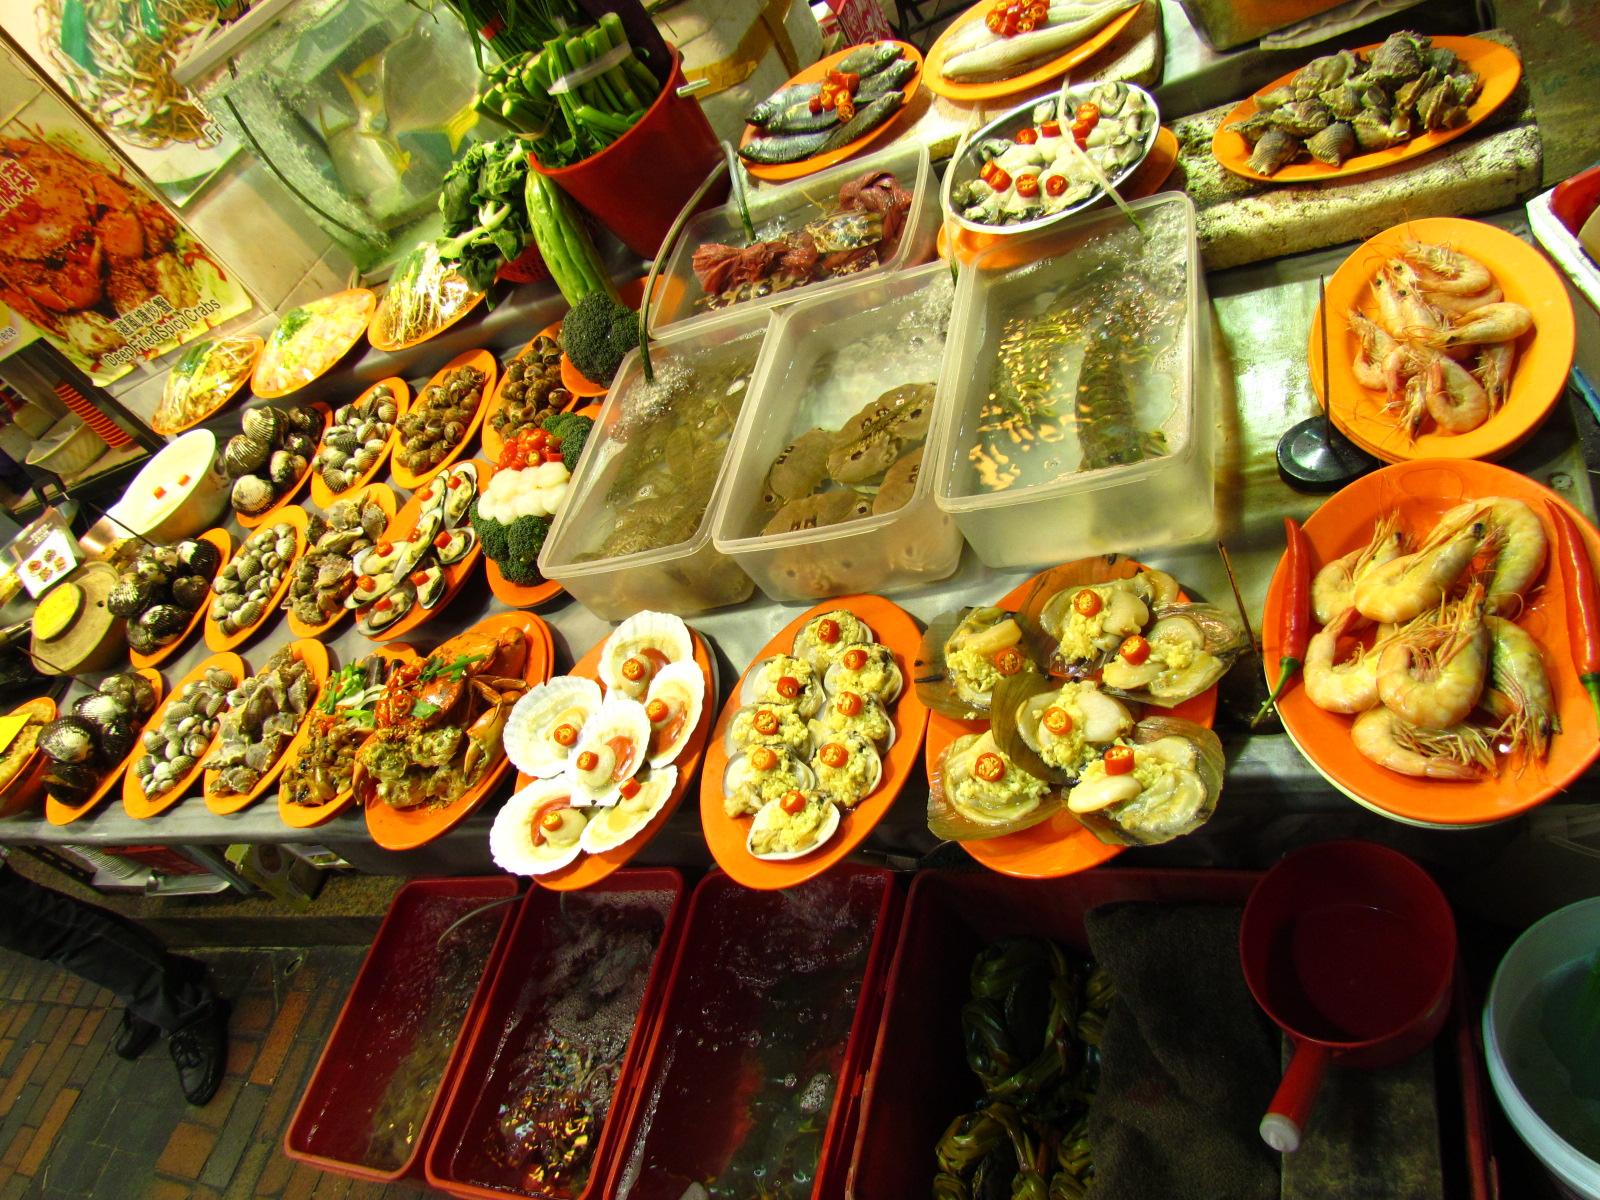 Hong Kong Seafood Restaurant Menu